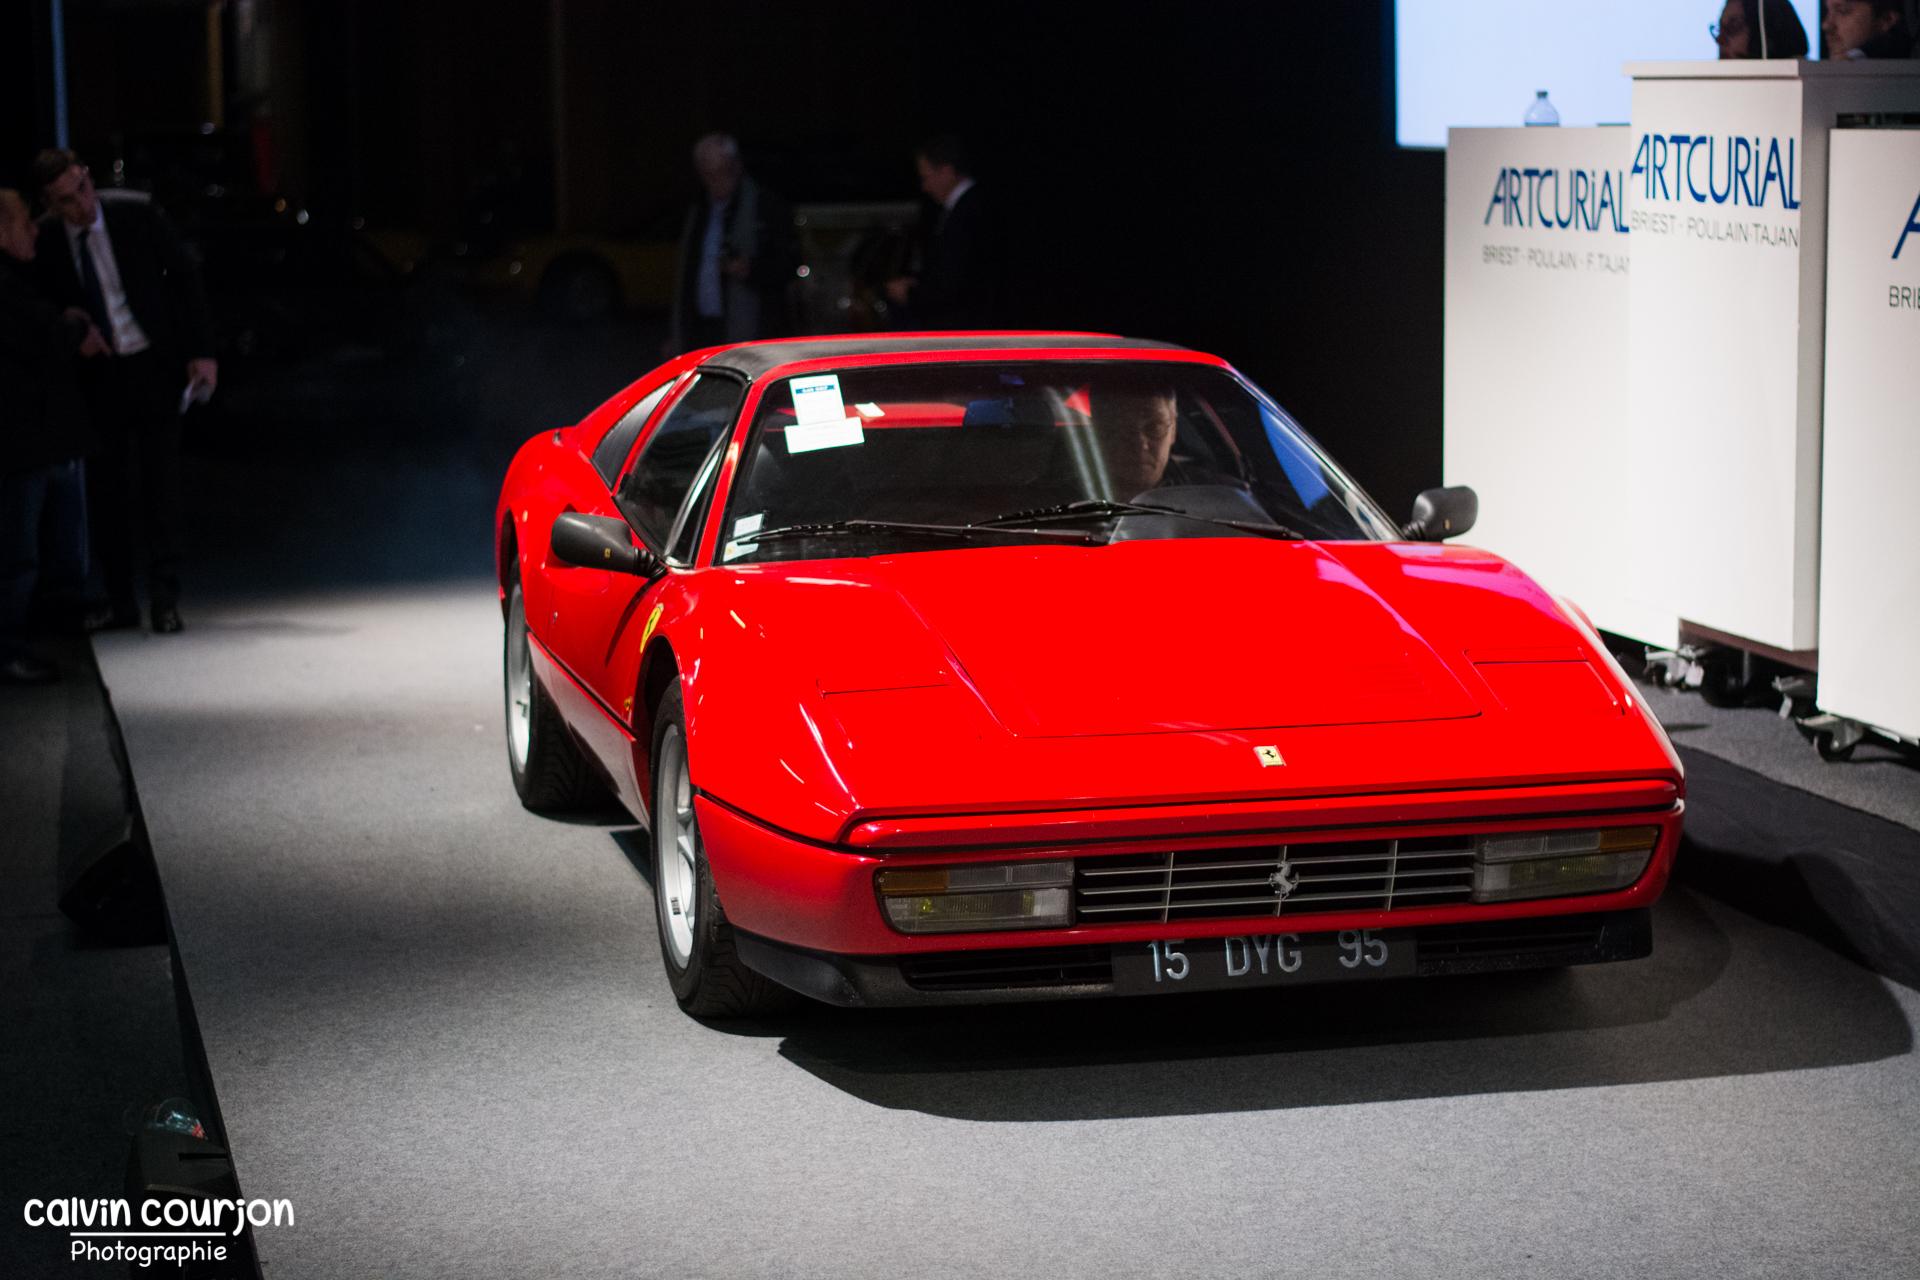 1987 Ferrari 328 GTS - Calvin Courjon Photographie